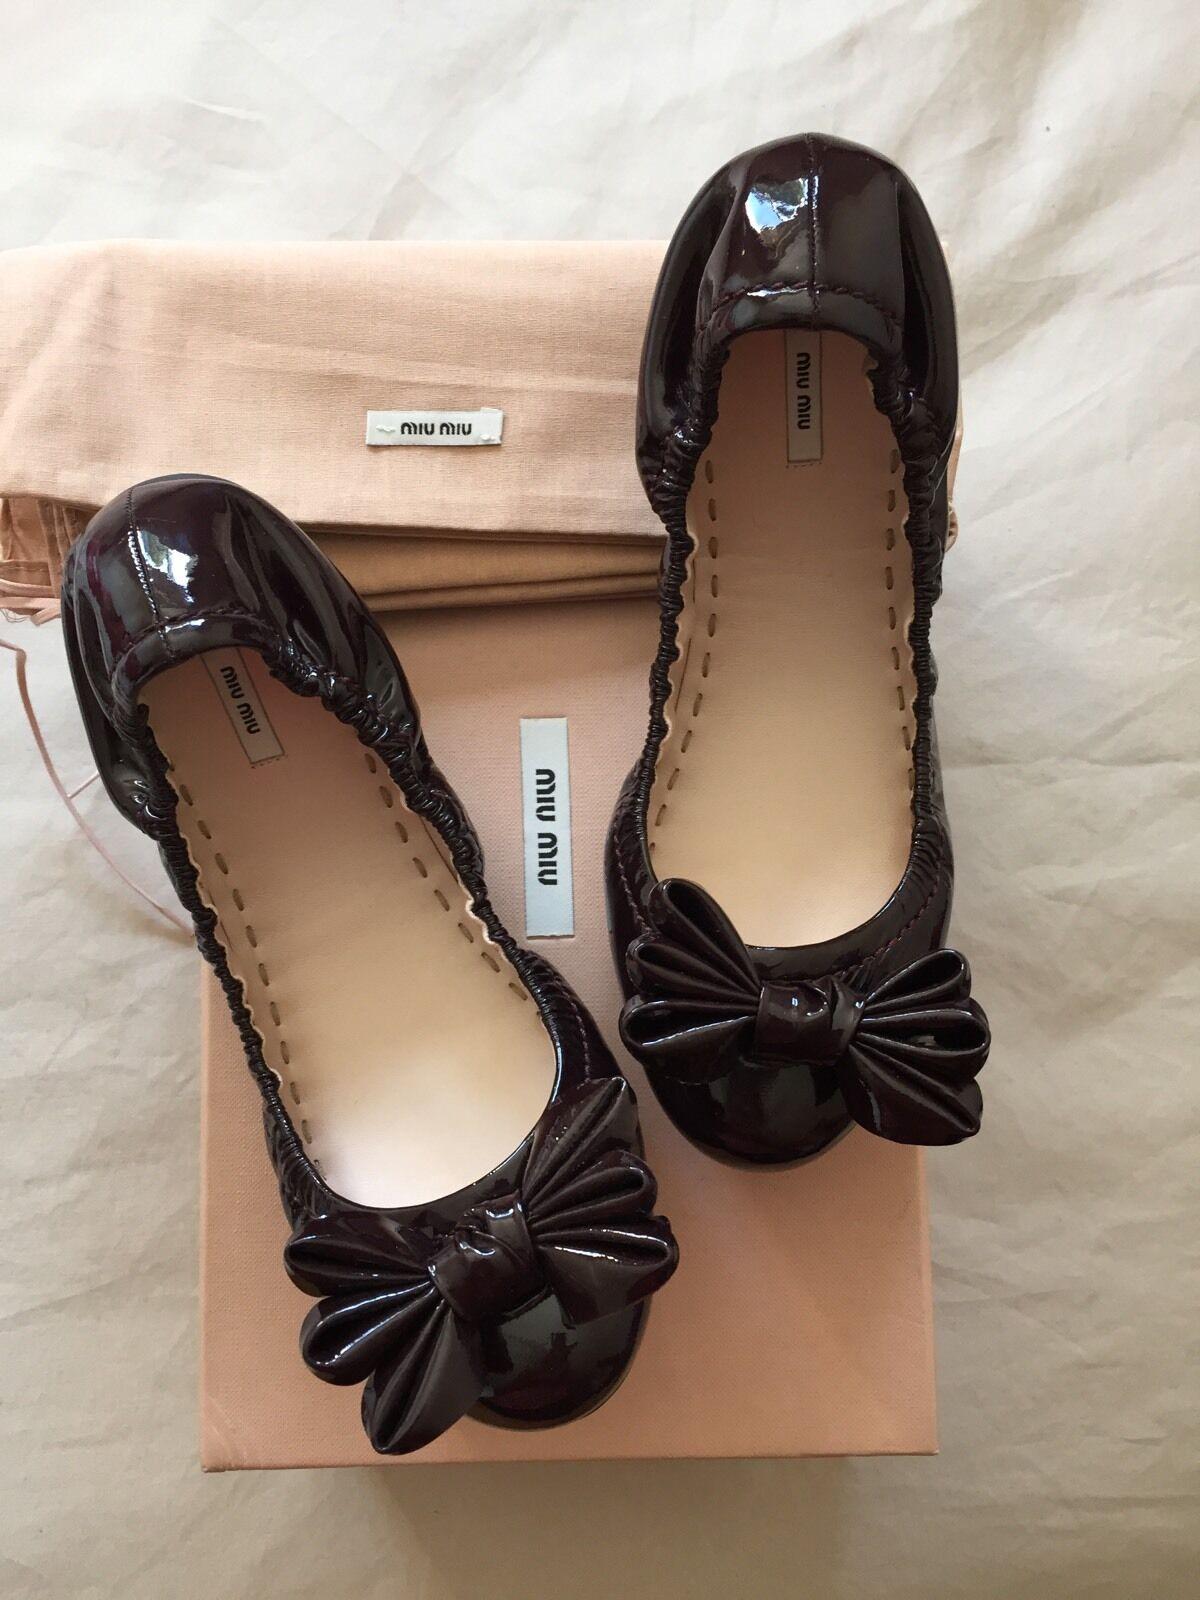 Miu Miu Bordeaux Patent Leather Ballet Flats Red Bow shoes BNIB UK 4 37